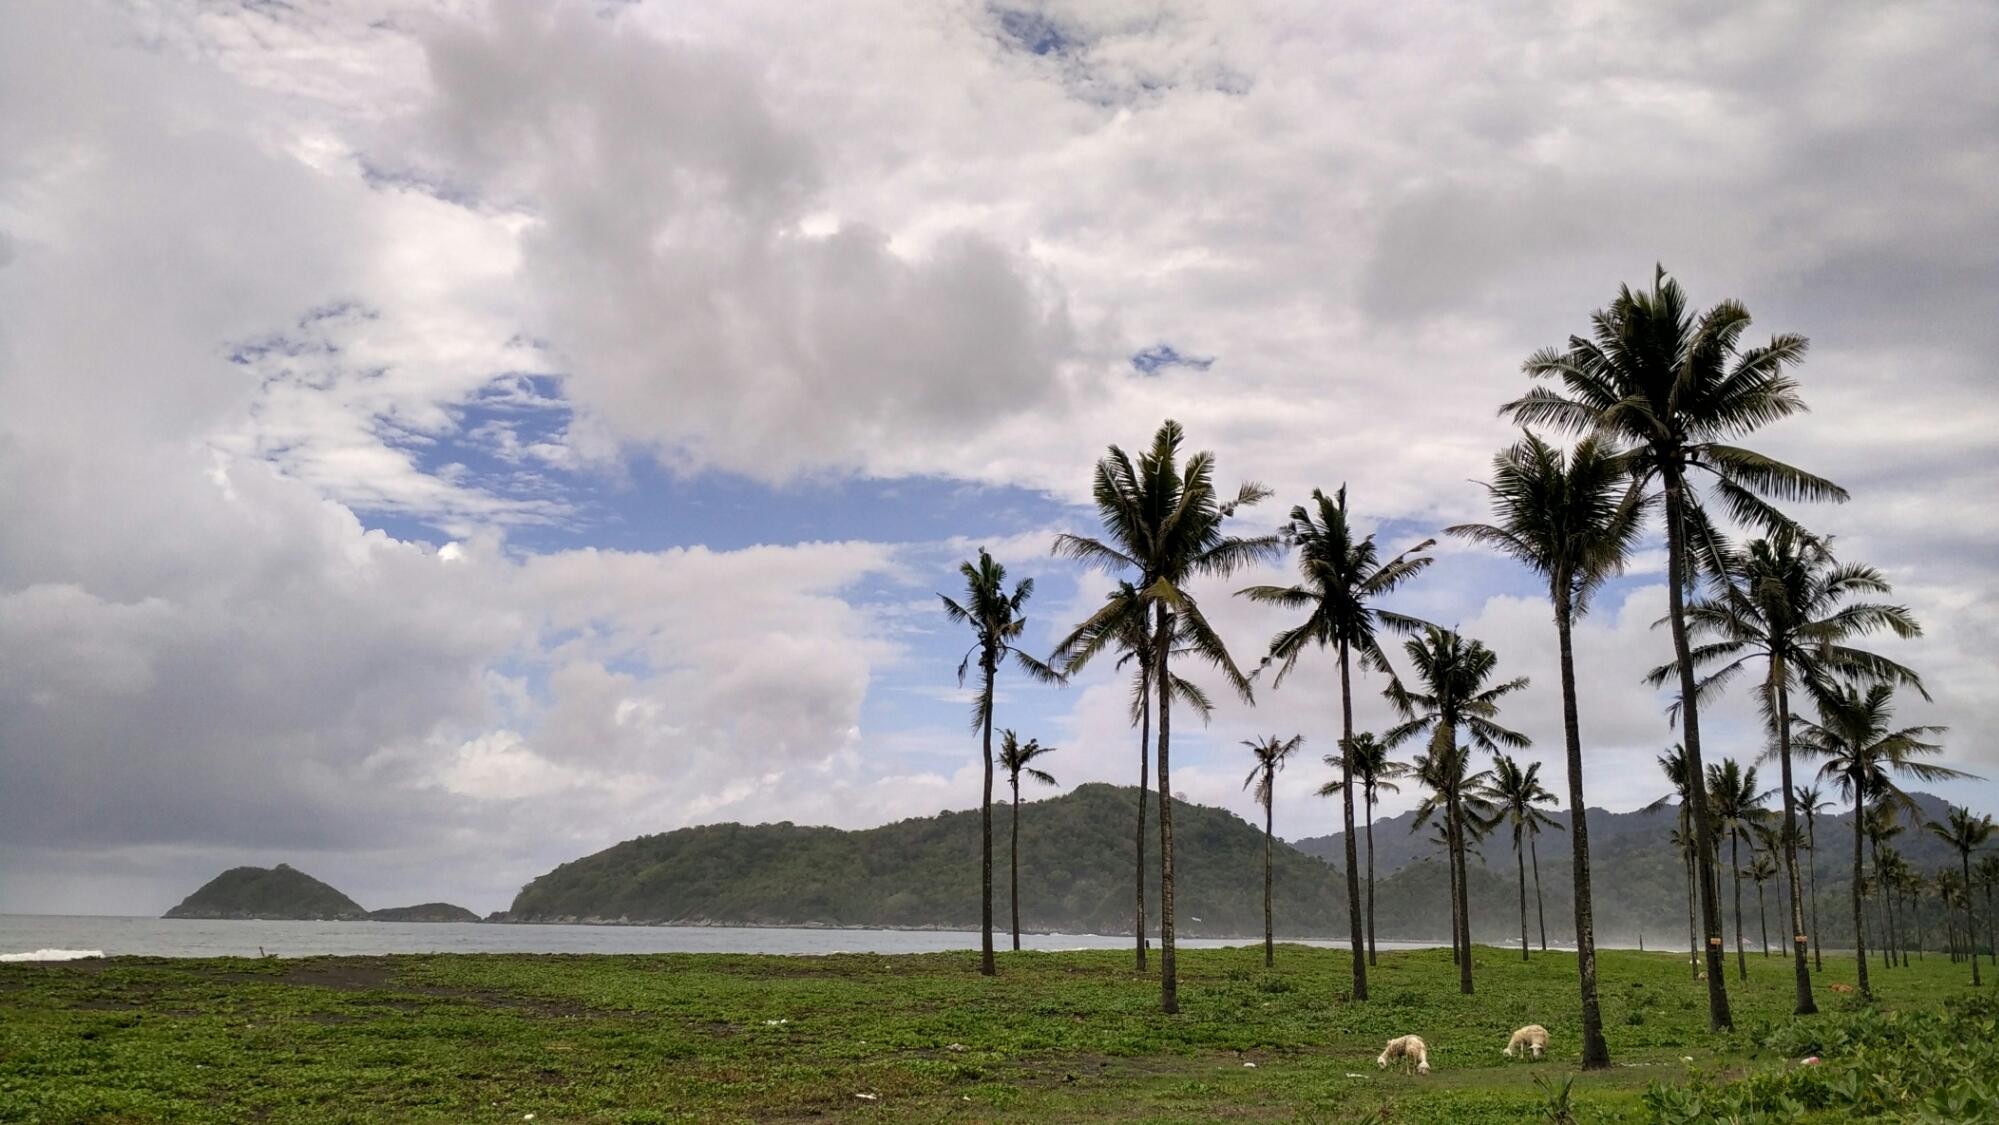 Perjalanan Menuju Pantai Parang Kursi Umikhoirun Blog Image Nah Penampakan